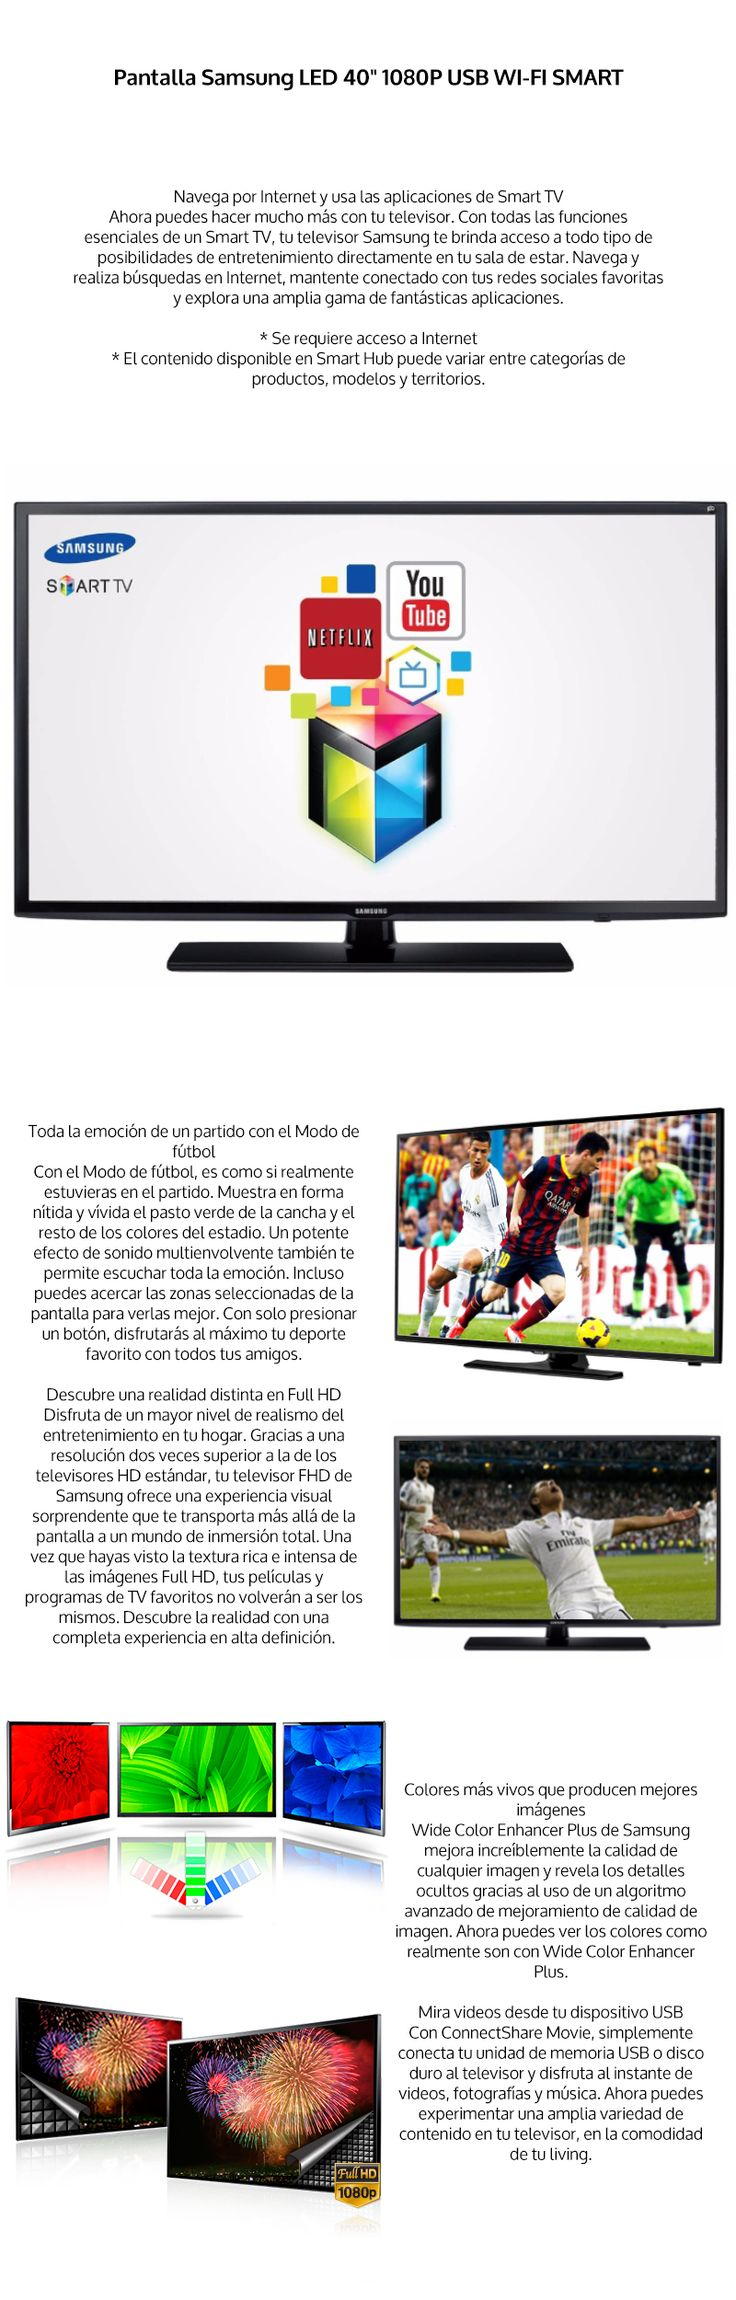 Pantalla Led Smart Tv Samsung 40 Pulgadas Full Hd Wifi Meses - $ 7,999.00